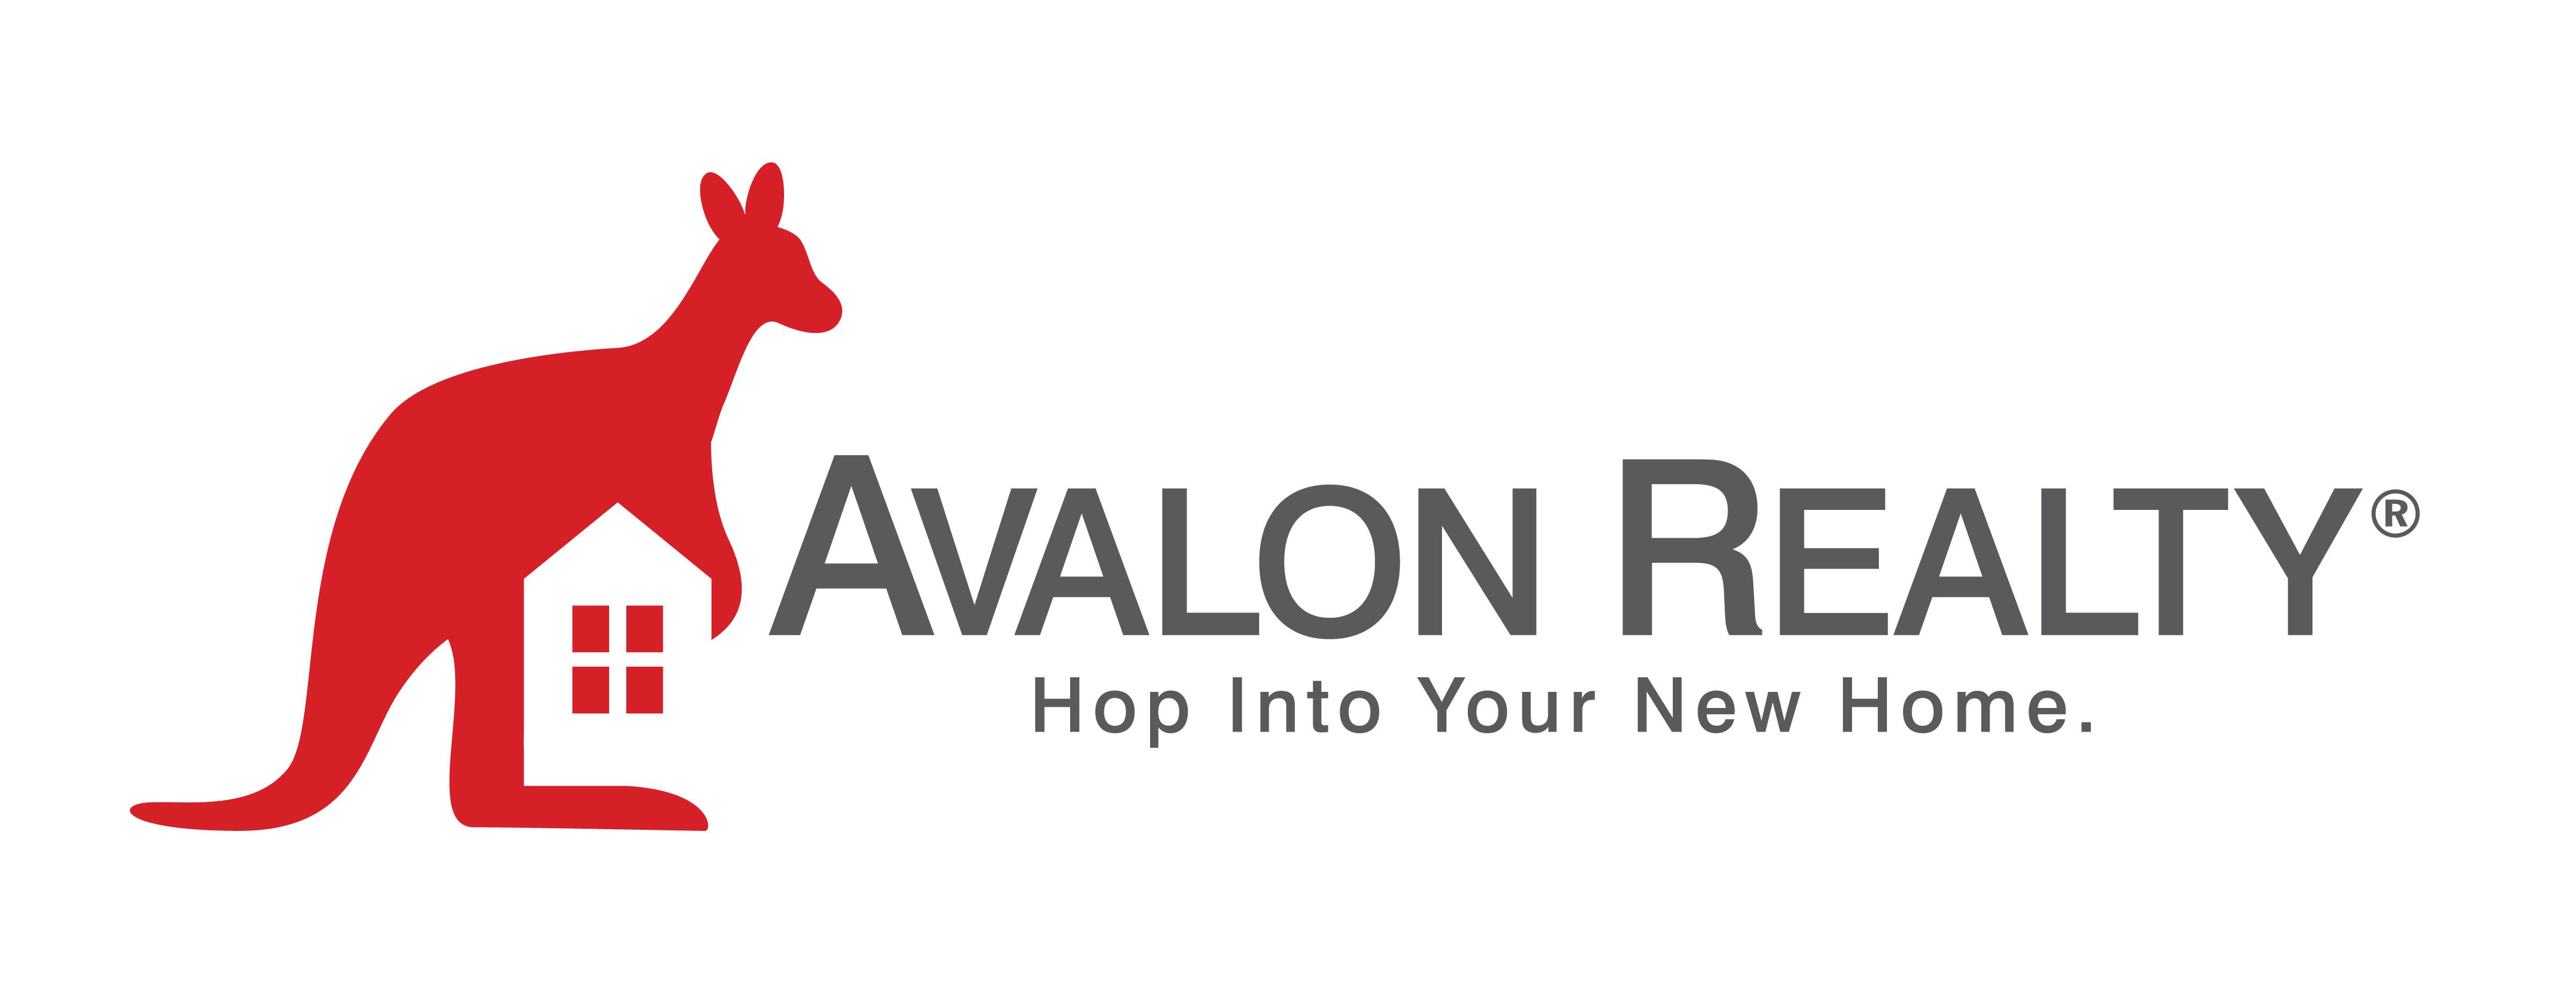 John Alexandrou: Avalon Realty Group